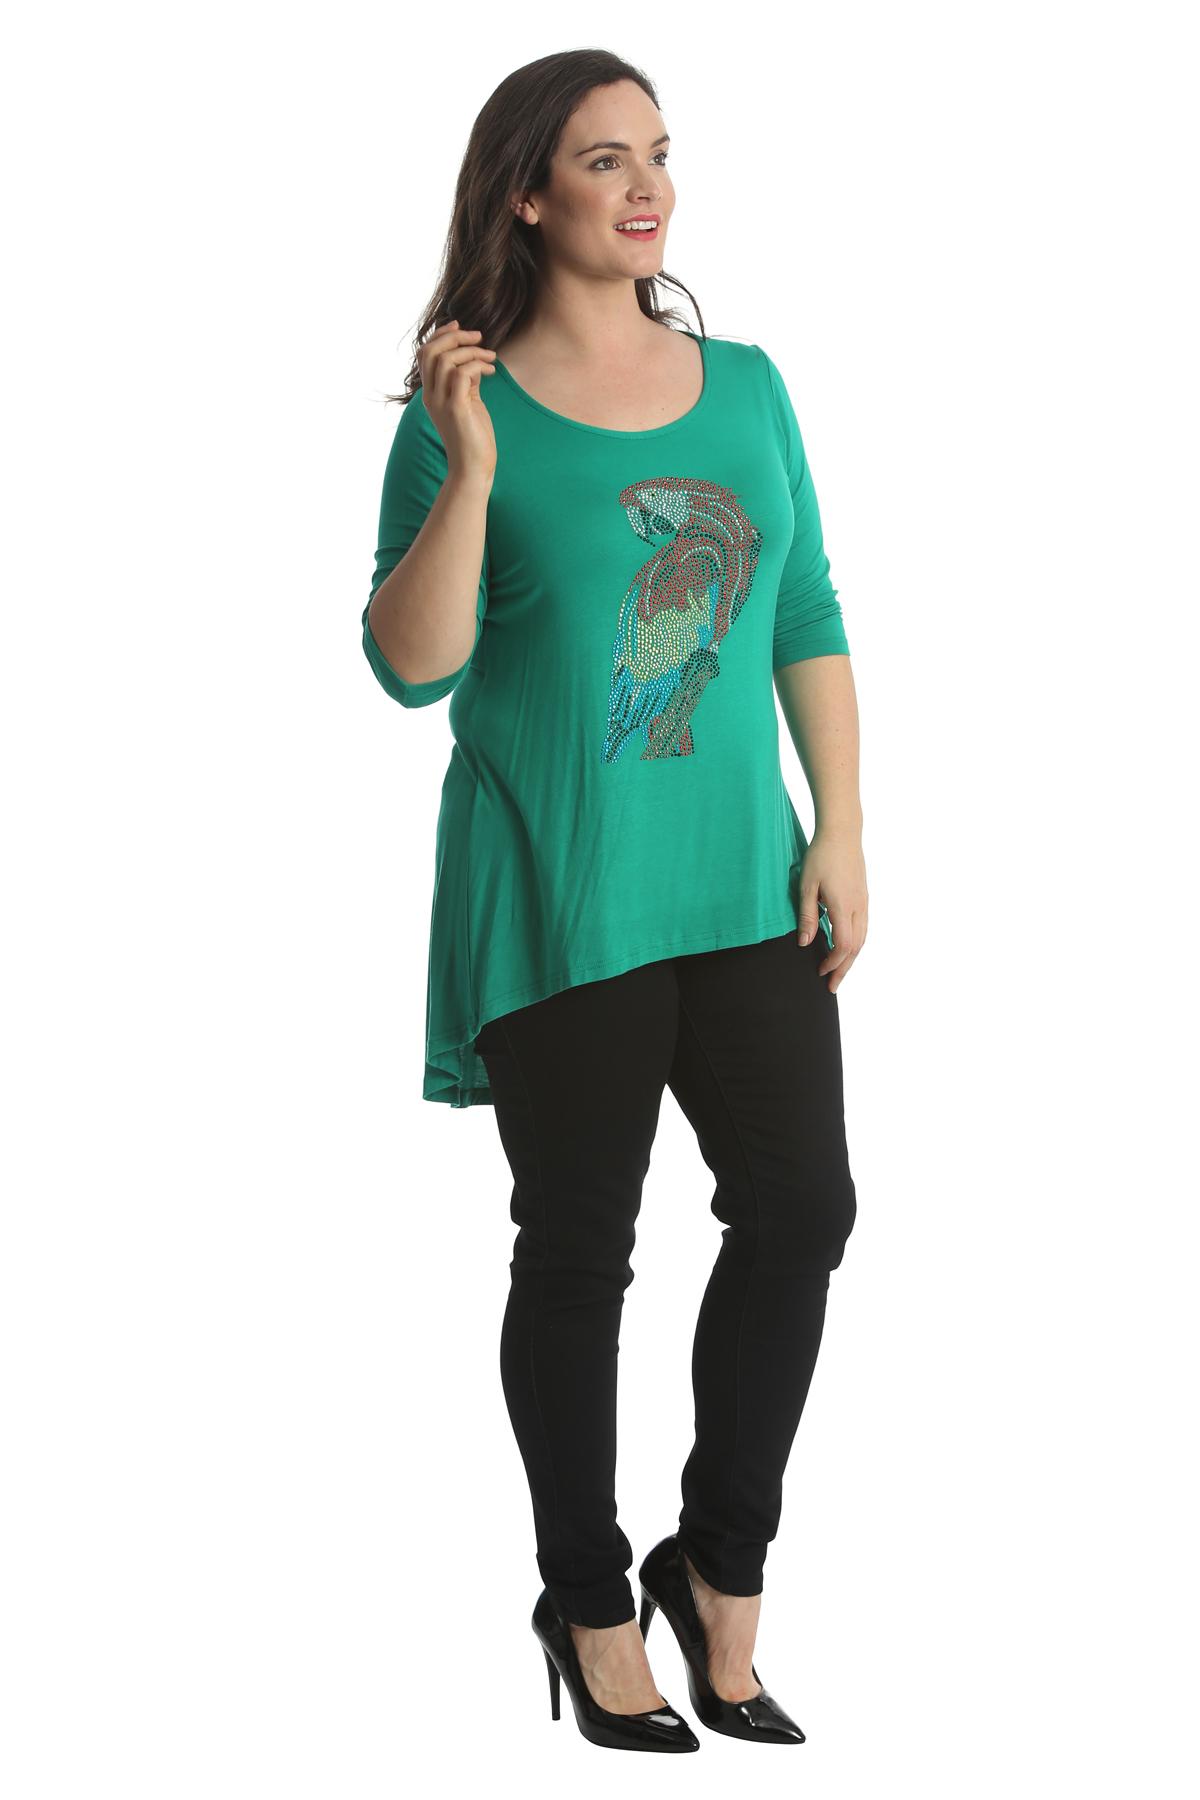 da86de1cf6d New Womens Tops Plus Size Ladies Parrot Rhinestones Bird Stud Shirt ...